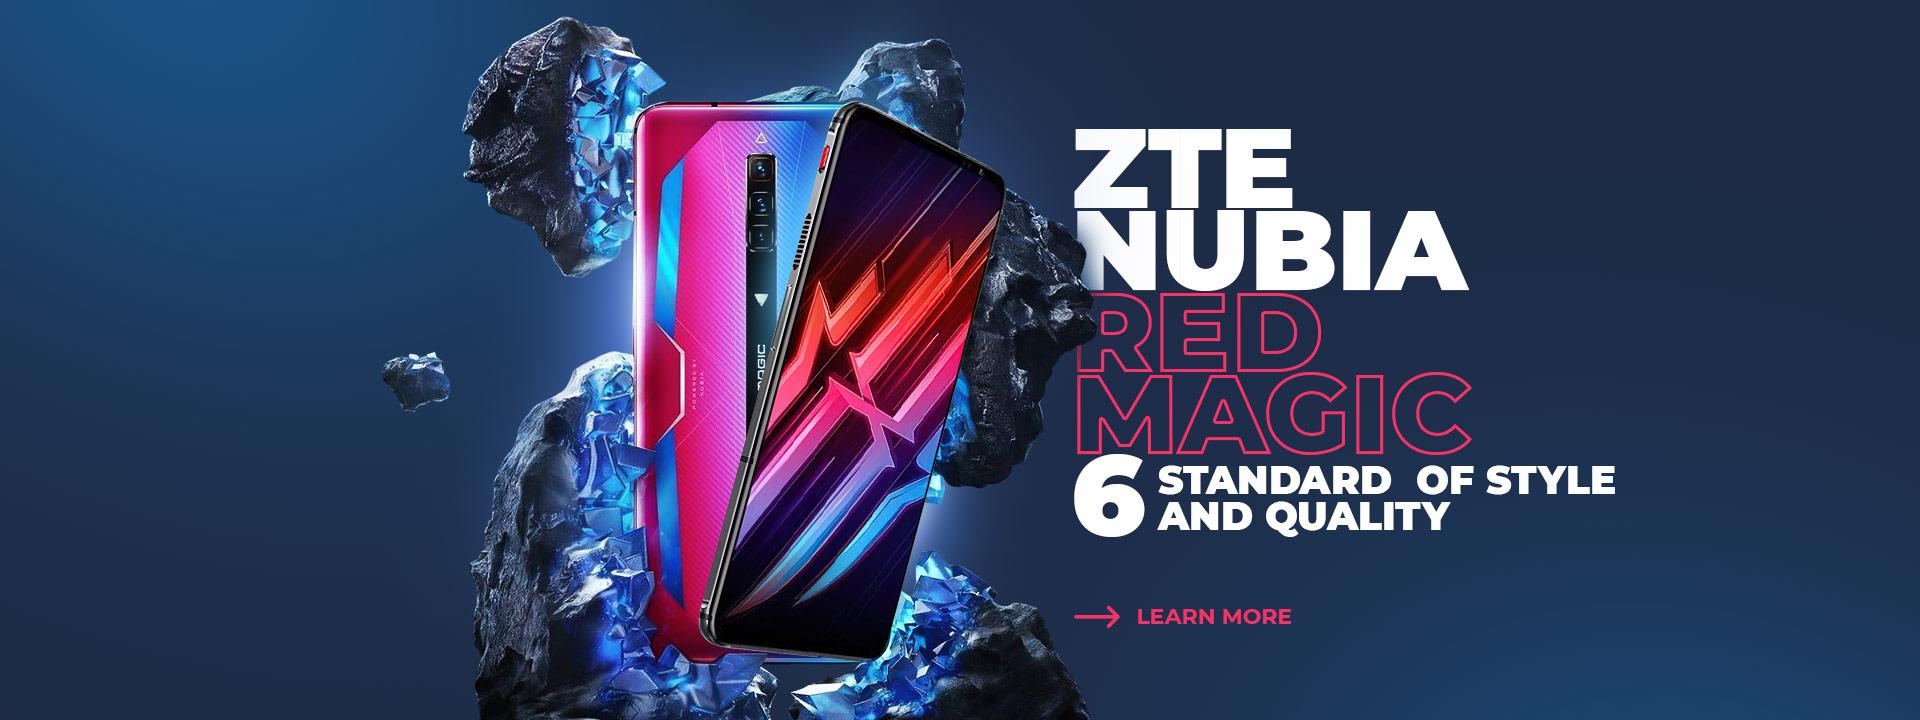 Buy a nubia smartphone